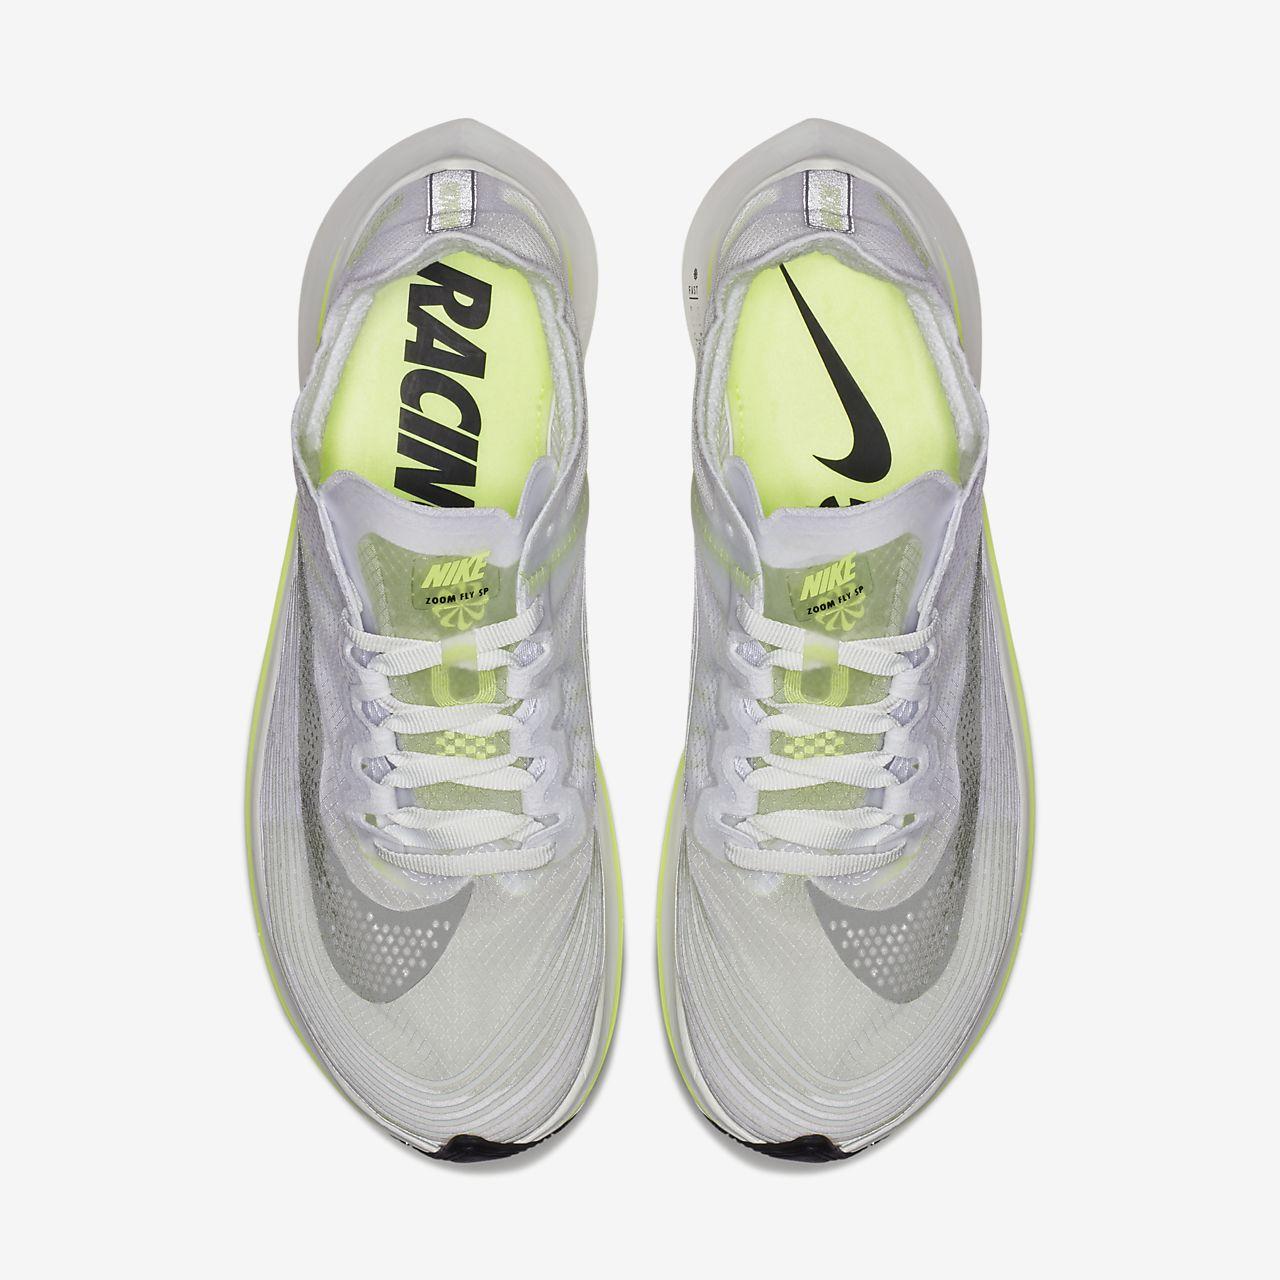 16138b906ea5 Nike Zoom Fly SP Women s Running Shoe. Nike.com NL